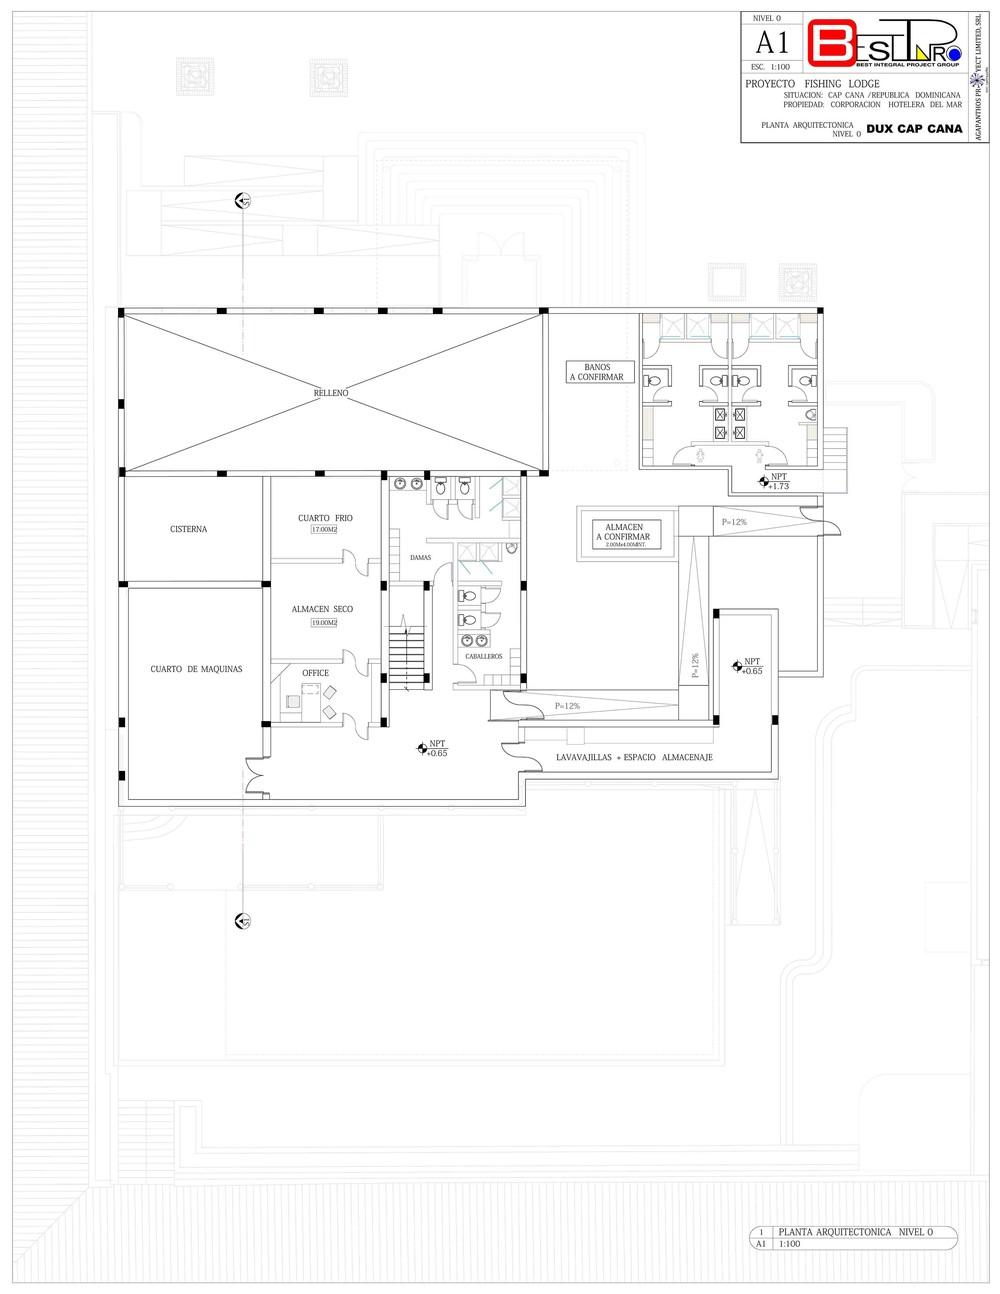 DUX nivel 0 - 12-07-12.jpg